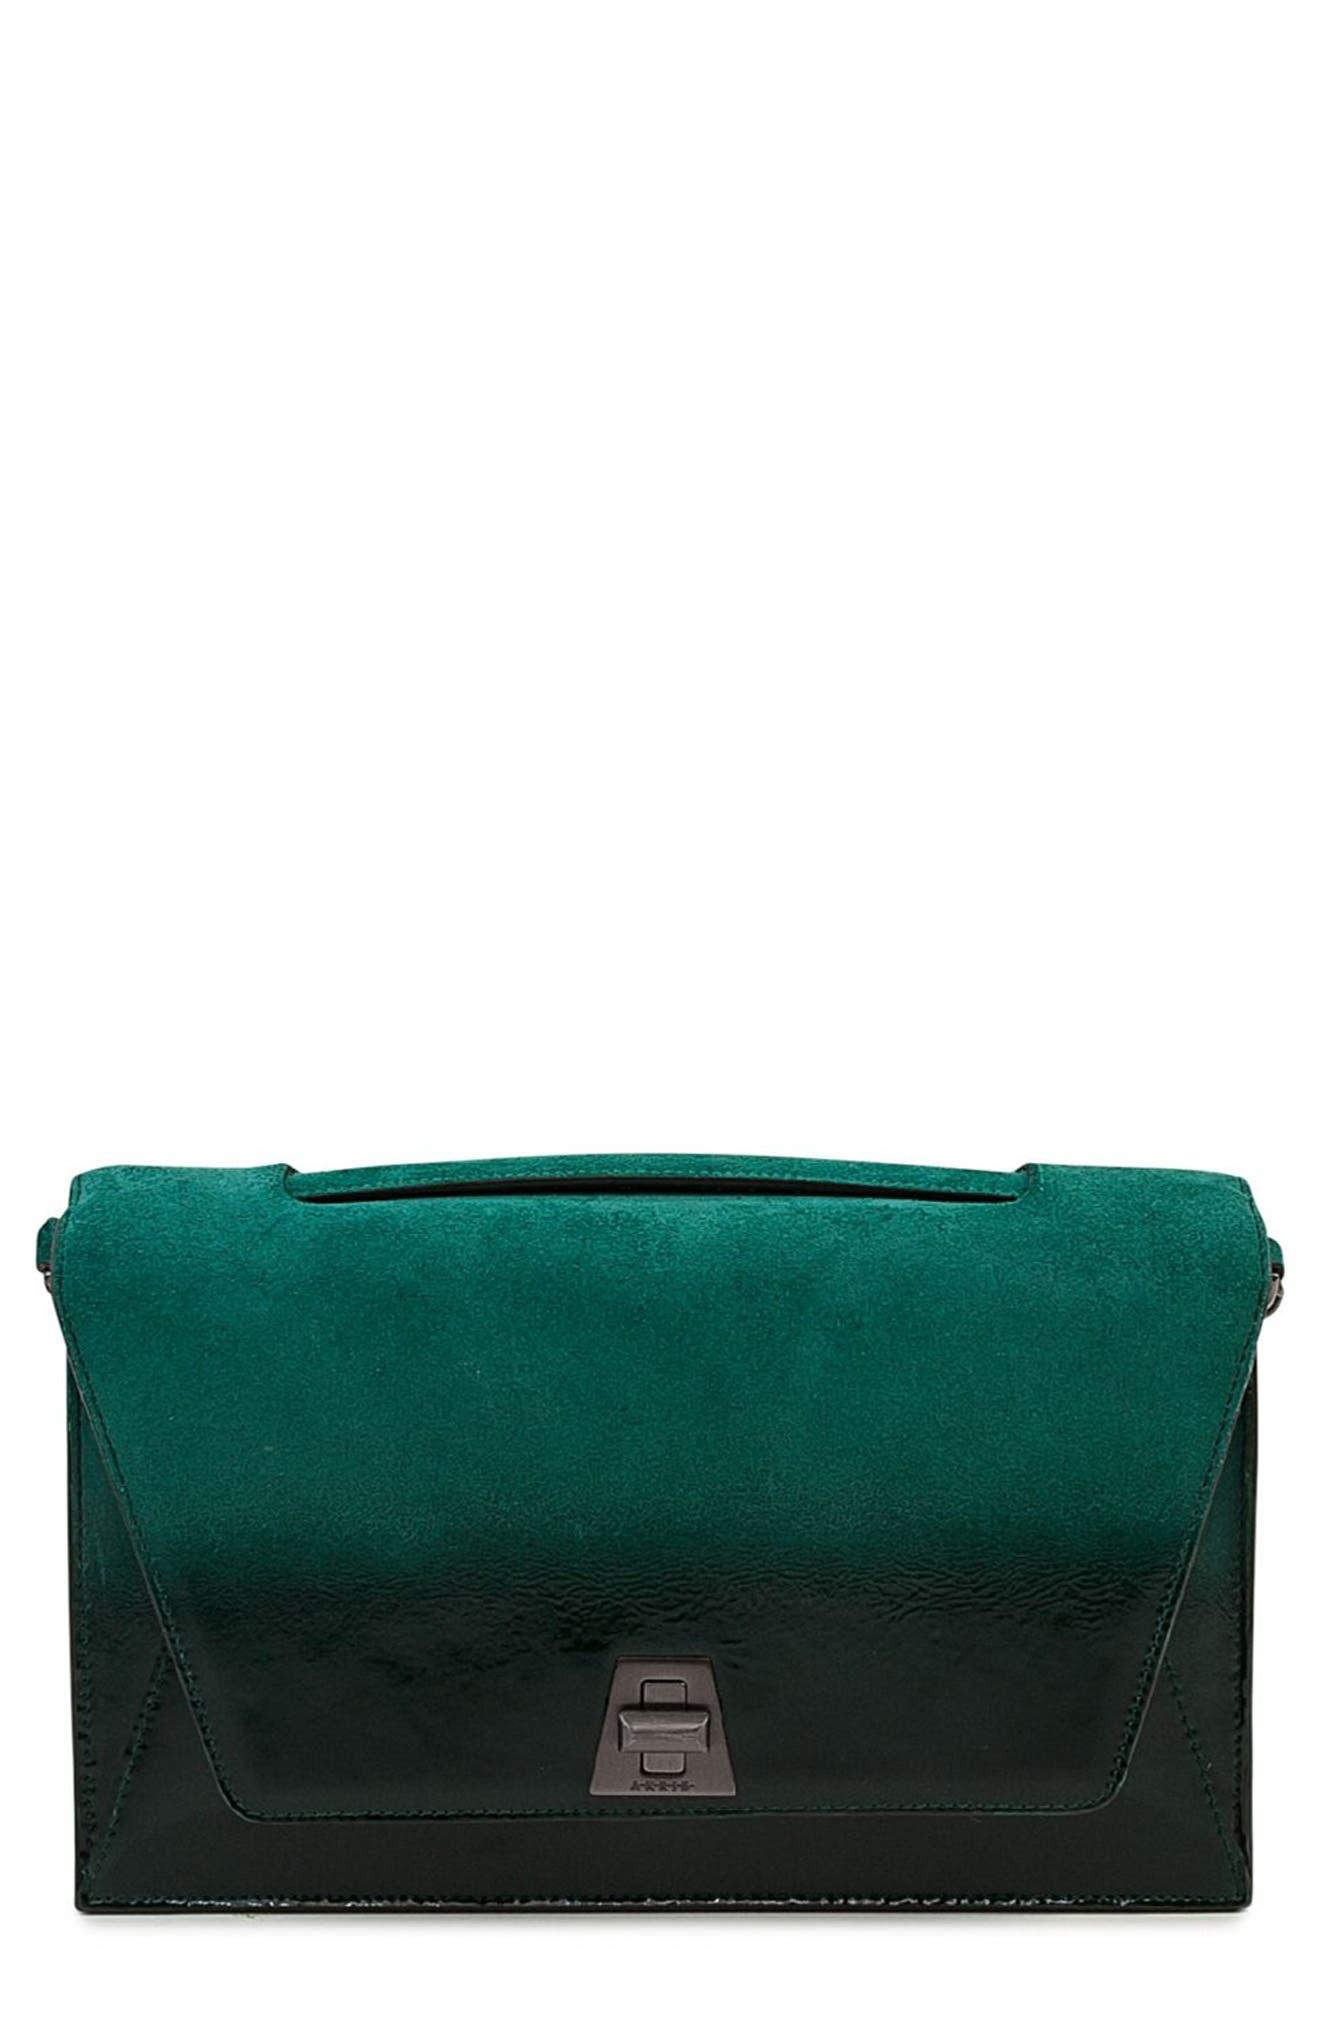 Akris Anouk City Lacquered Leather Crossbody Bag